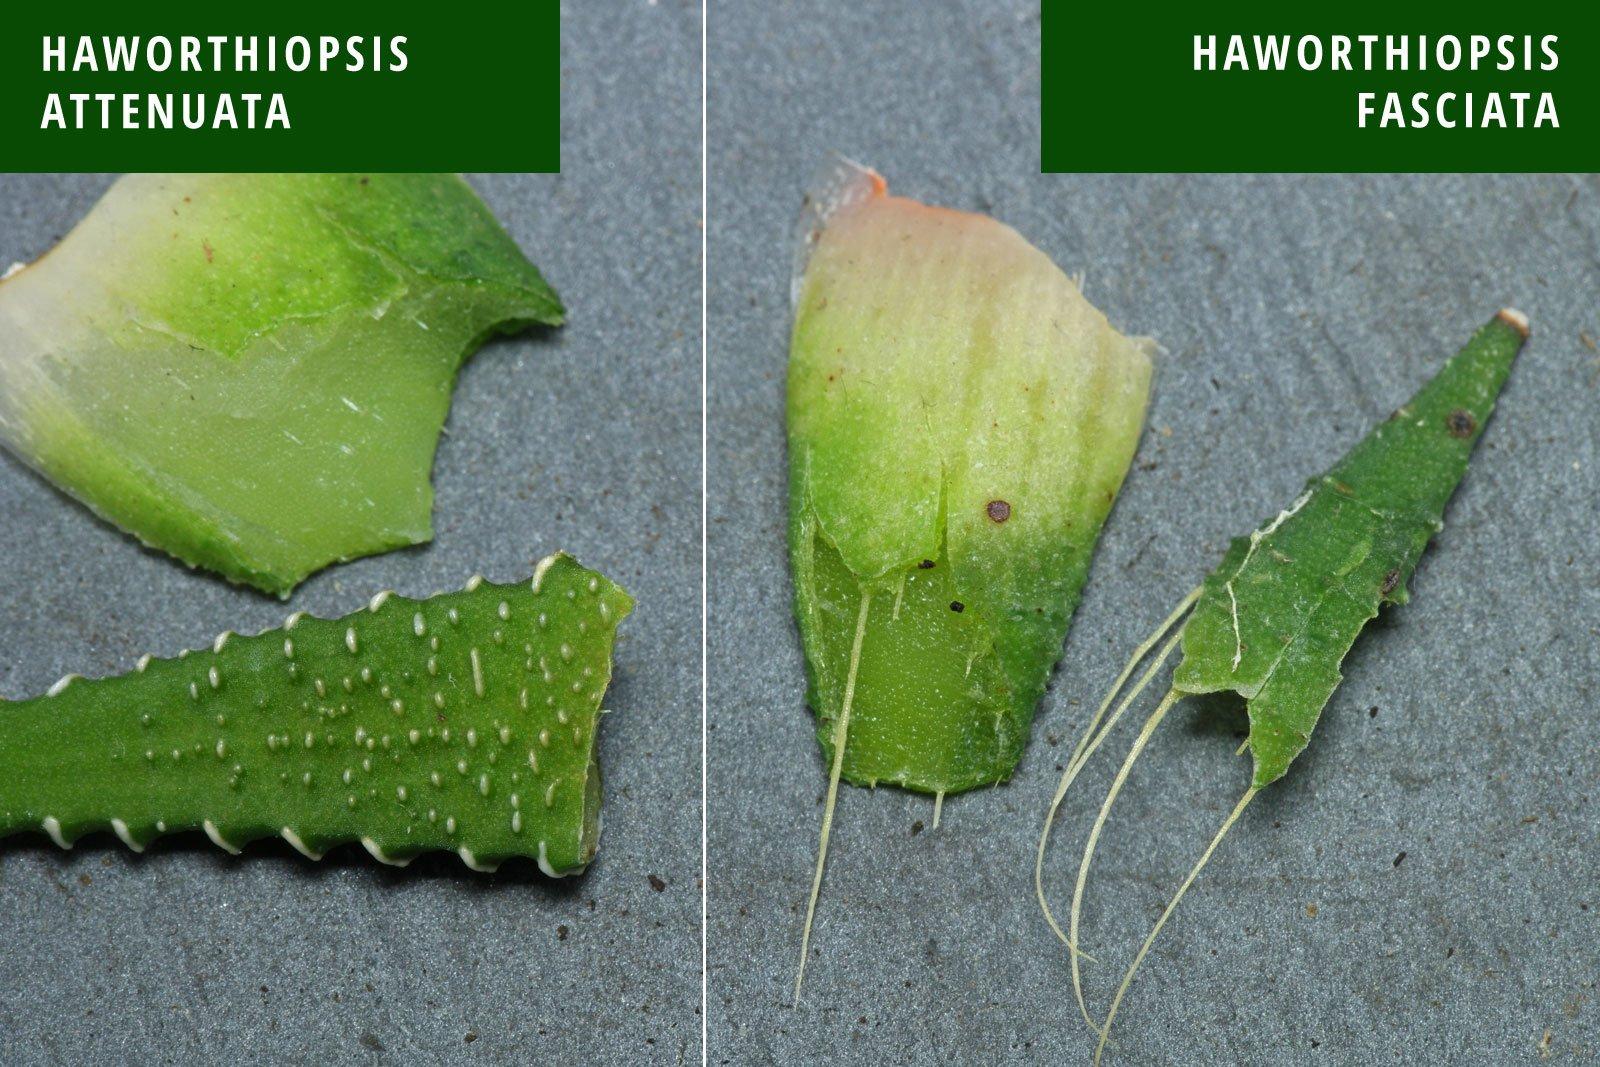 Haworthia attenuata fasciata